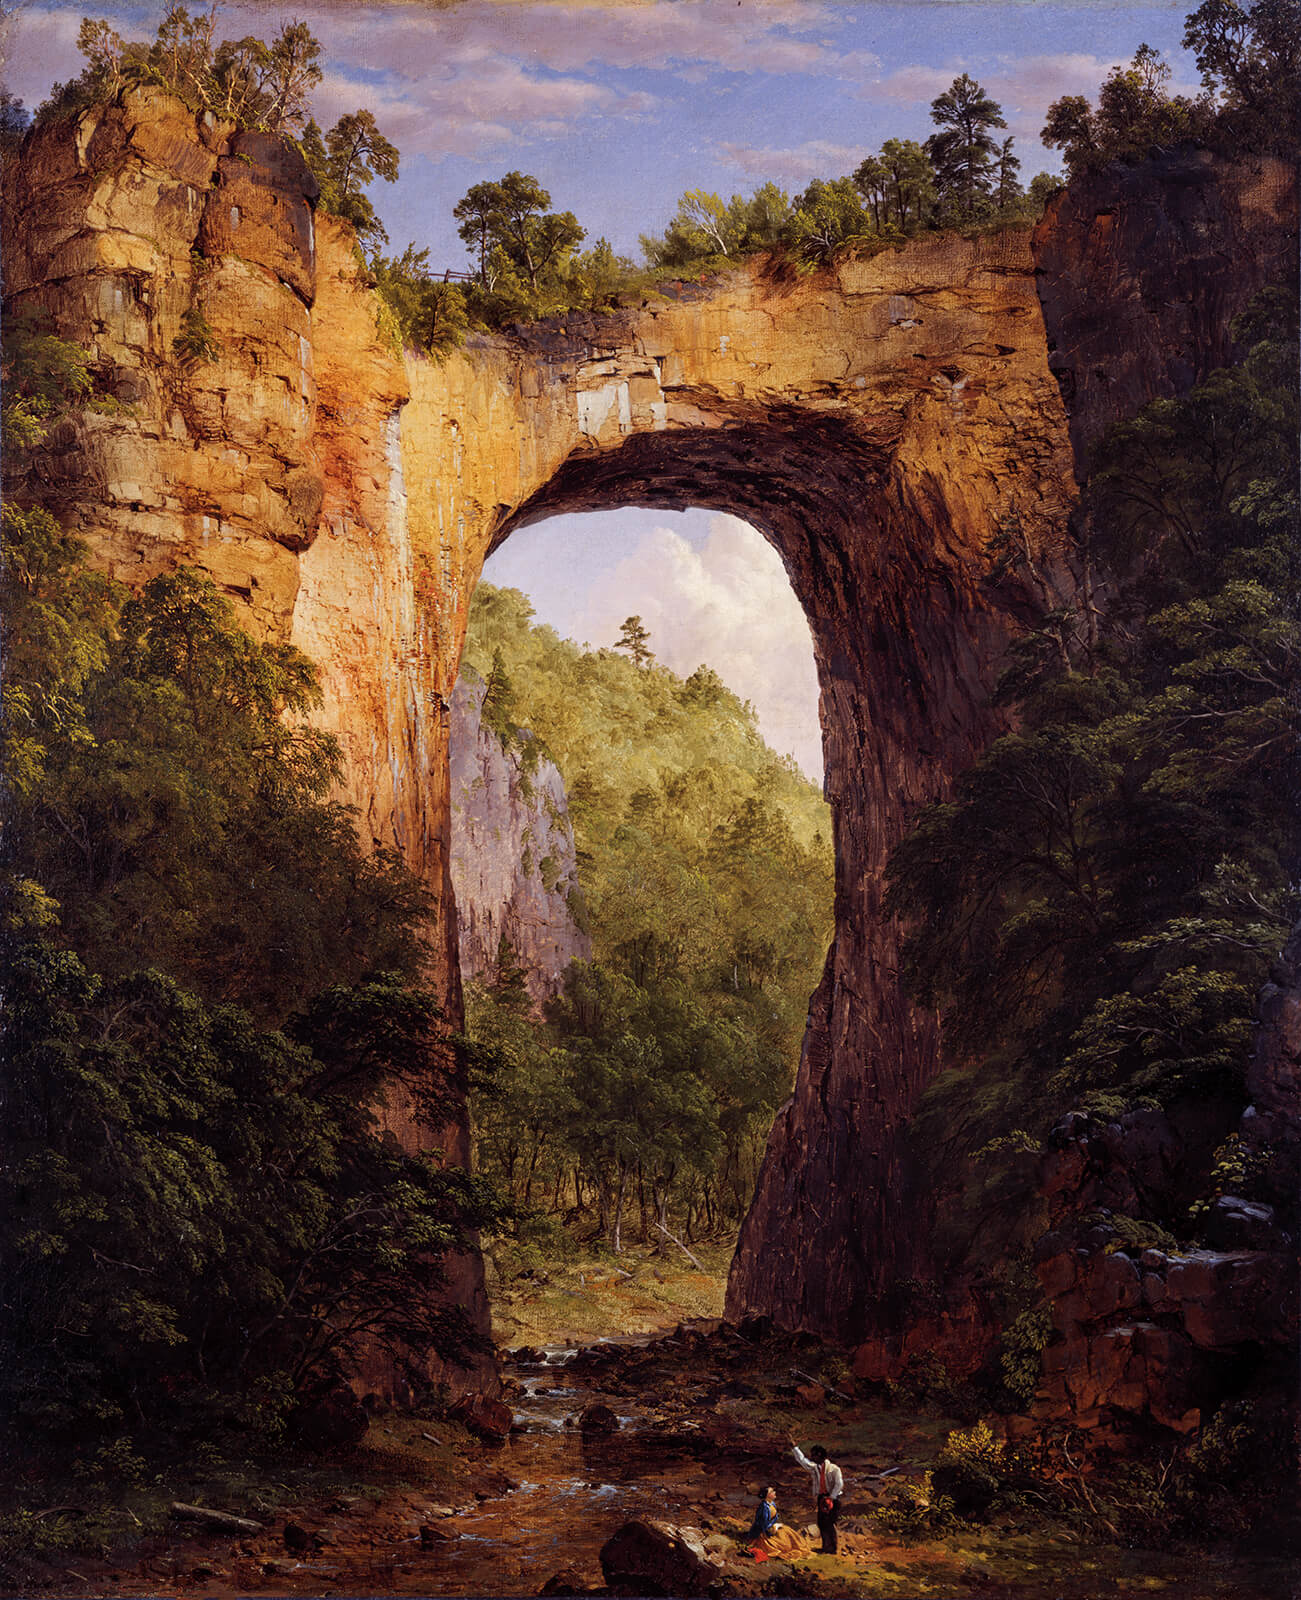 Frederic Edwin Church, The Natural Bridge, Virginia